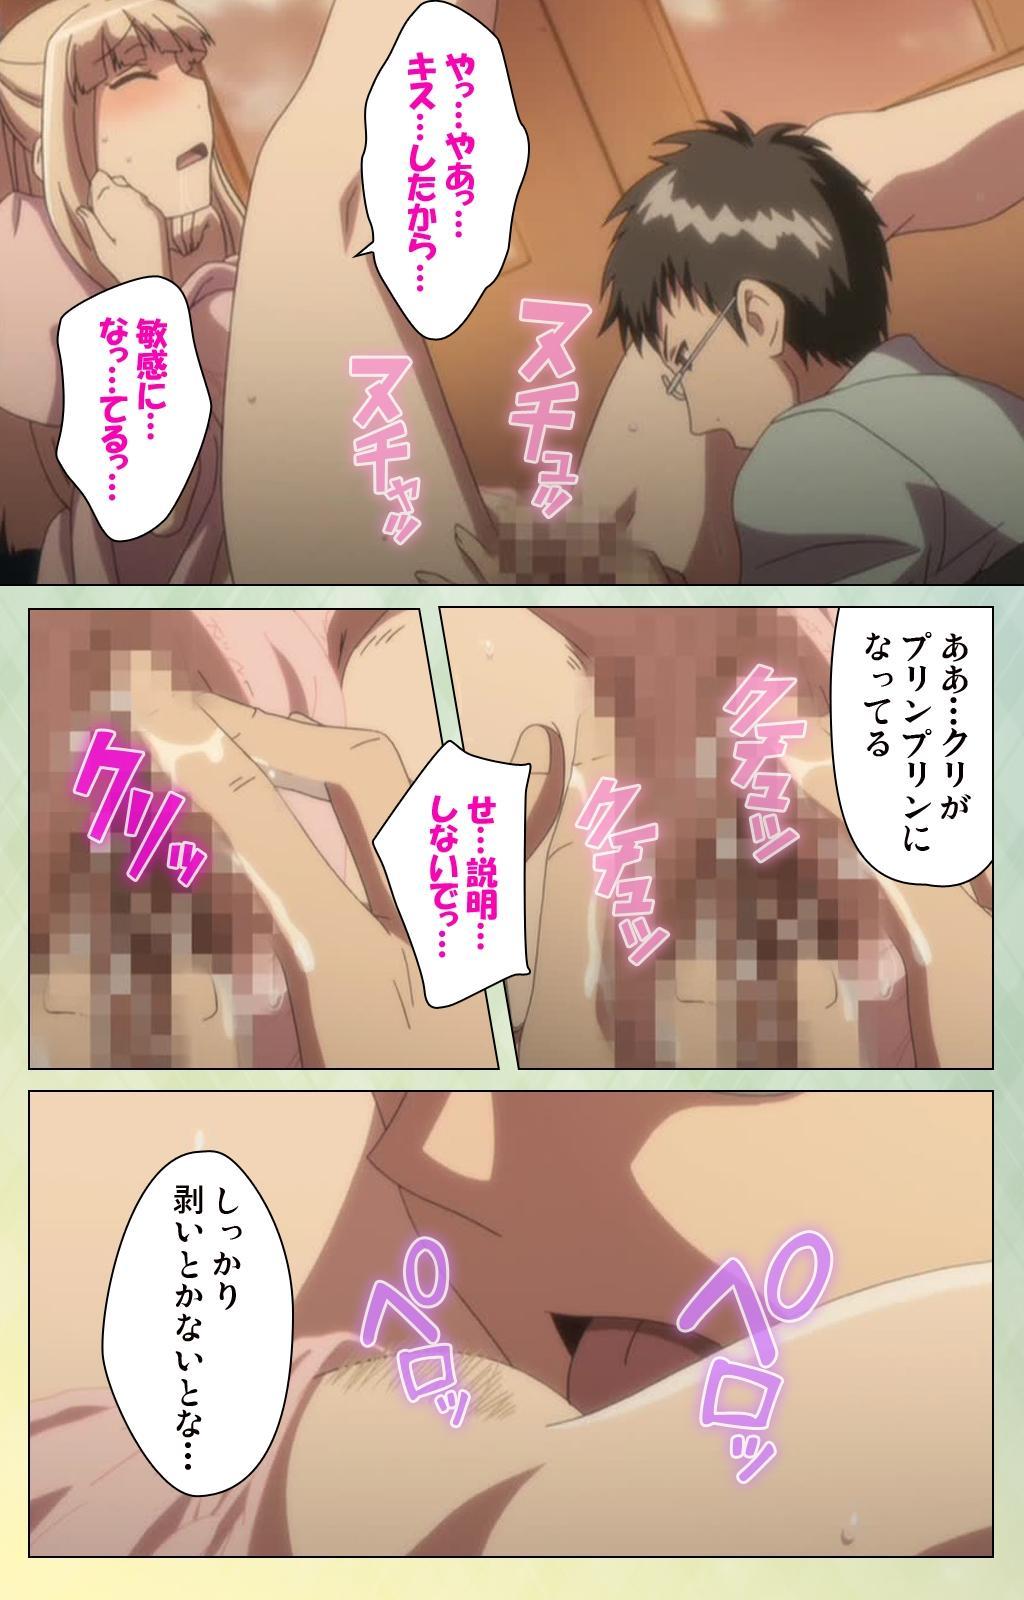 Furueru Kuchibiru fuzzy lips1 Complete Ban 63